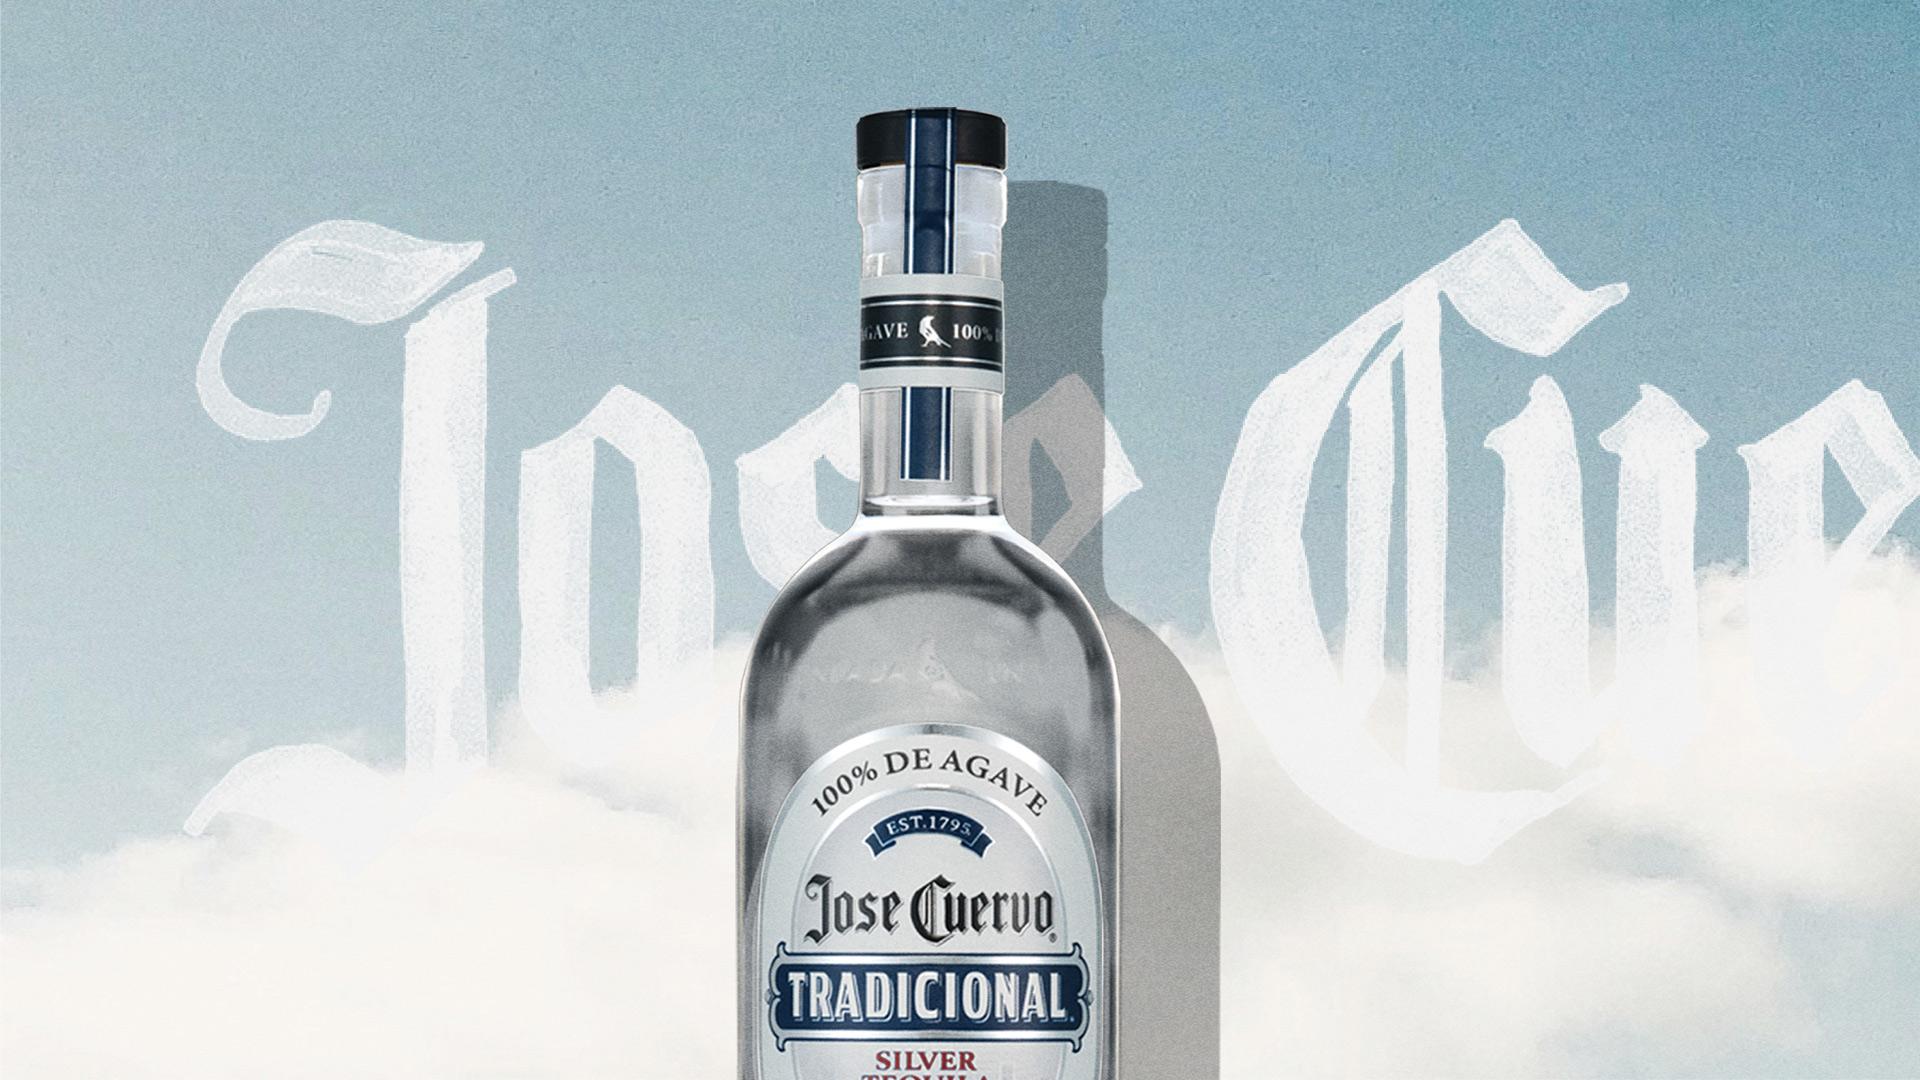 Jose Cuervo Tradicional – Brand Identity & Social Direction